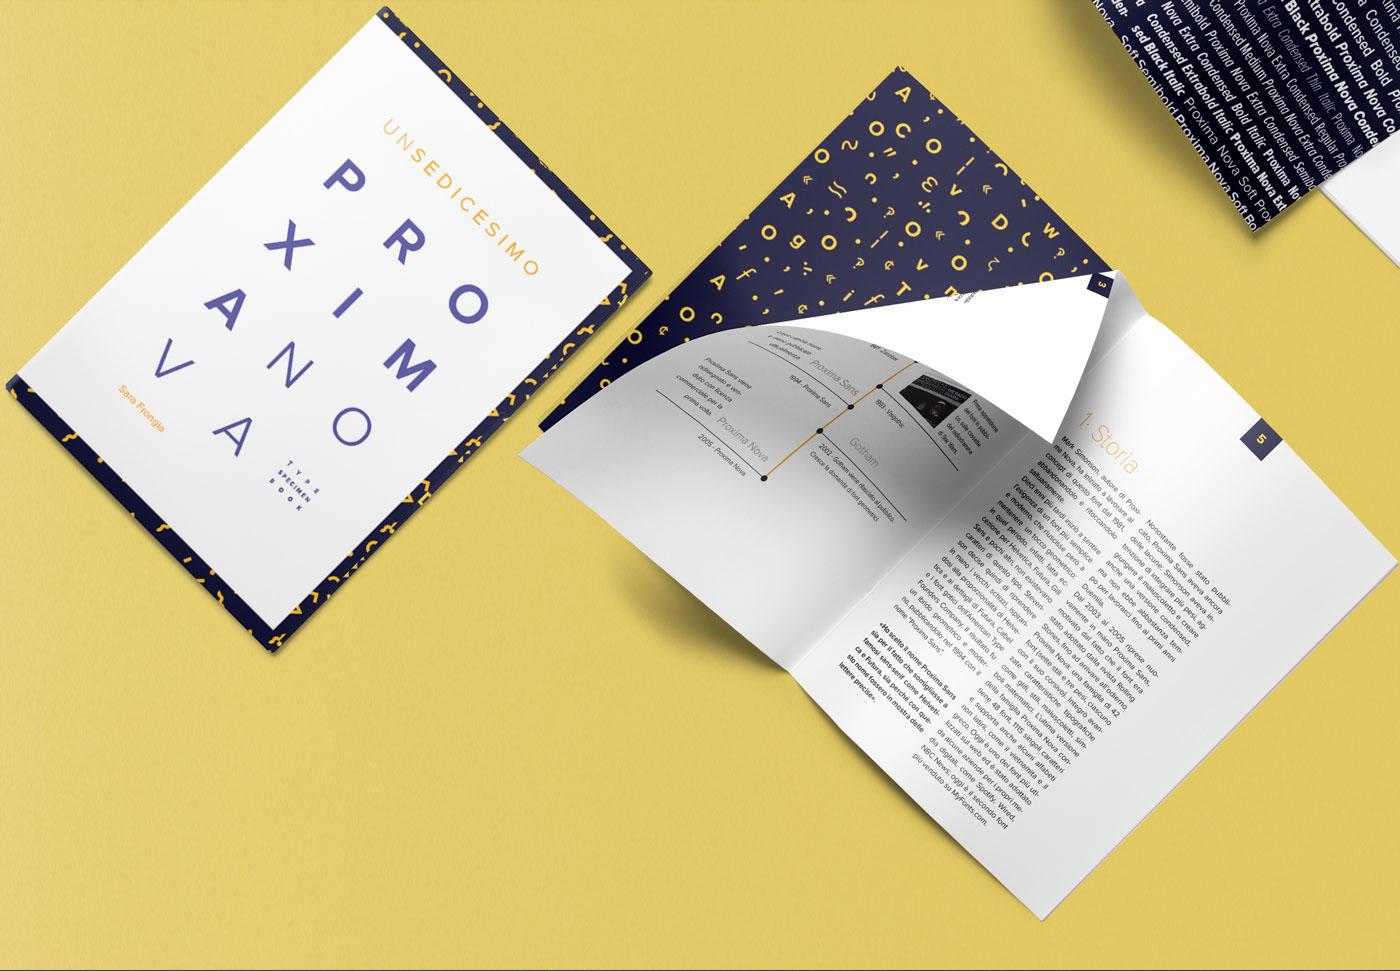 Proxima Nova | Font Booklet on Behance